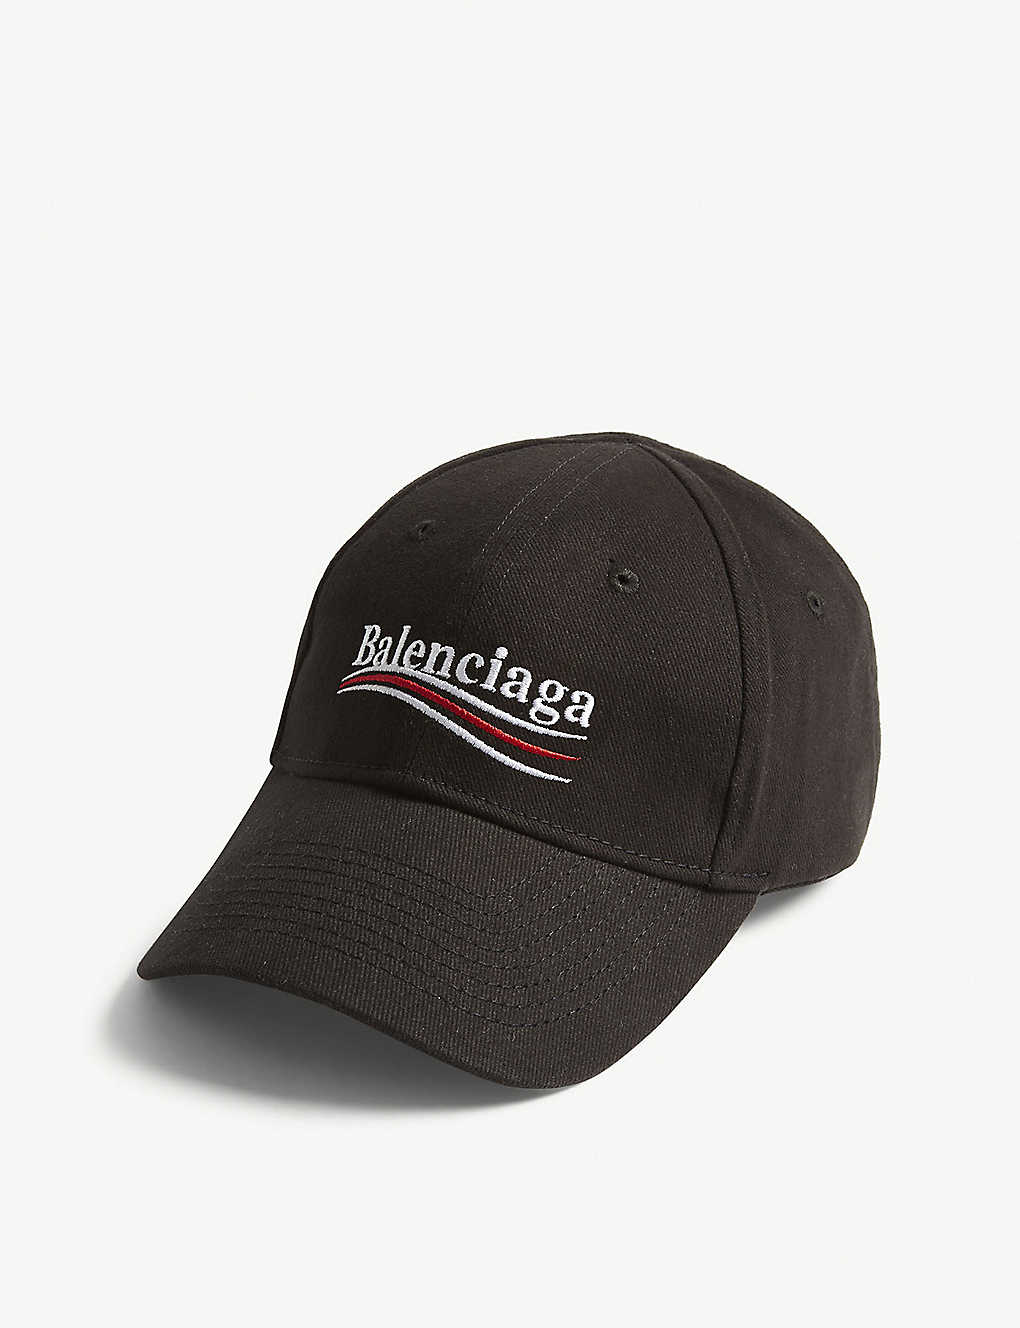 0bd13545b07 BALENCIAGA - Bernie logo cotton strapback cap